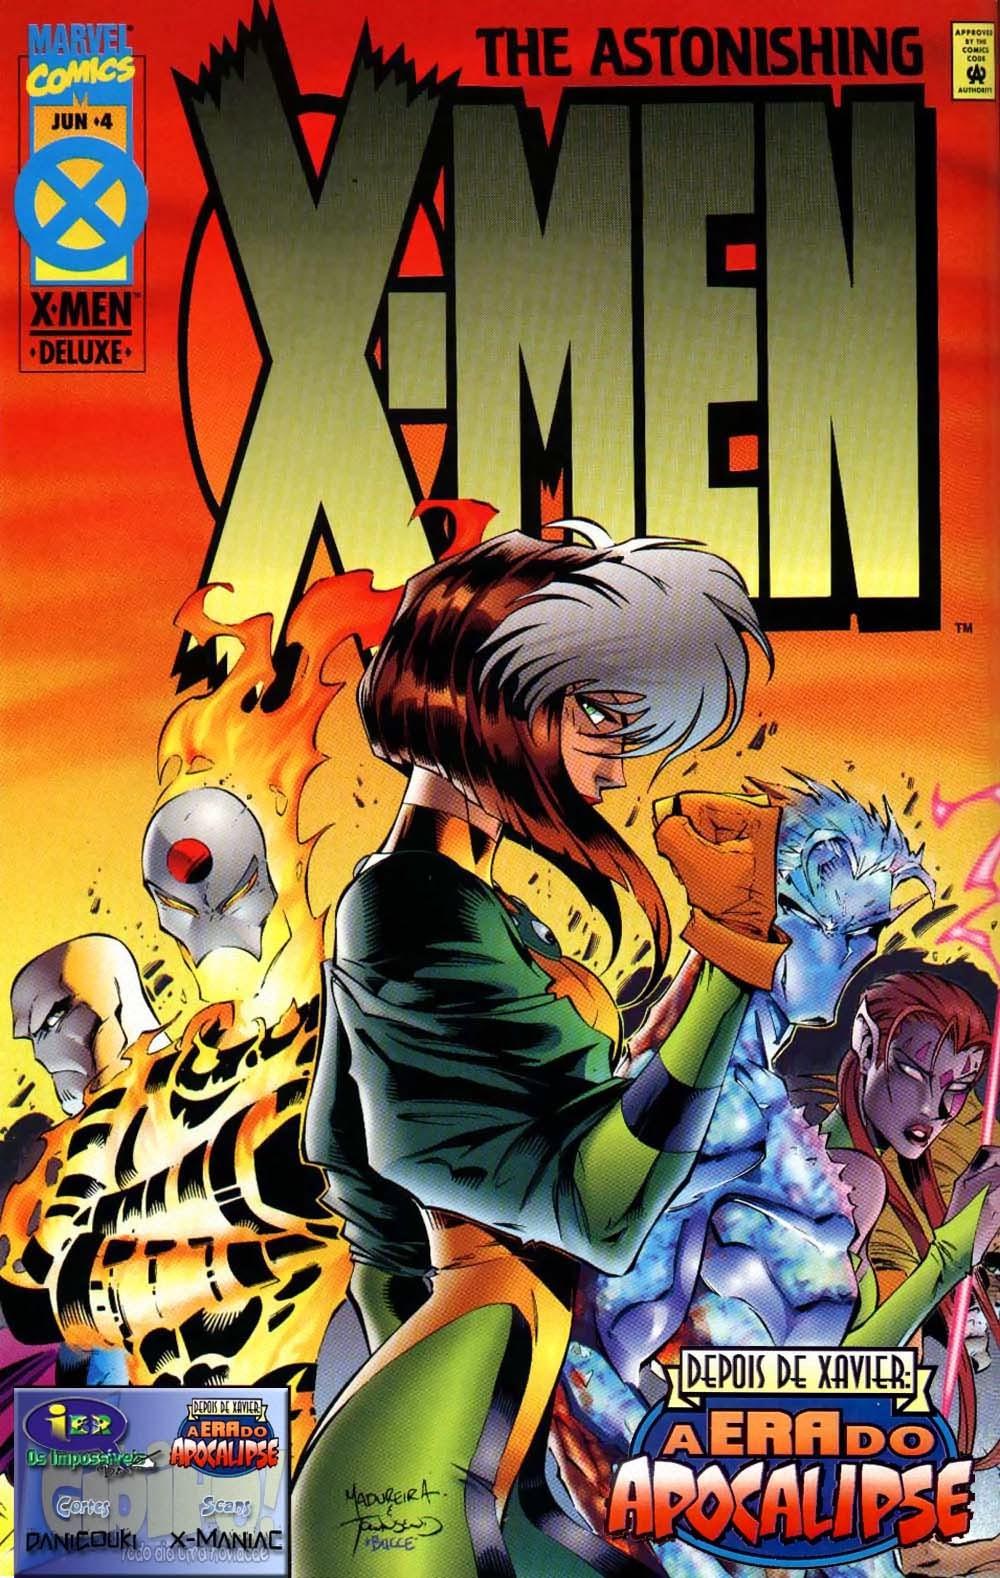 X-Men - A Era do Apocalipse #38